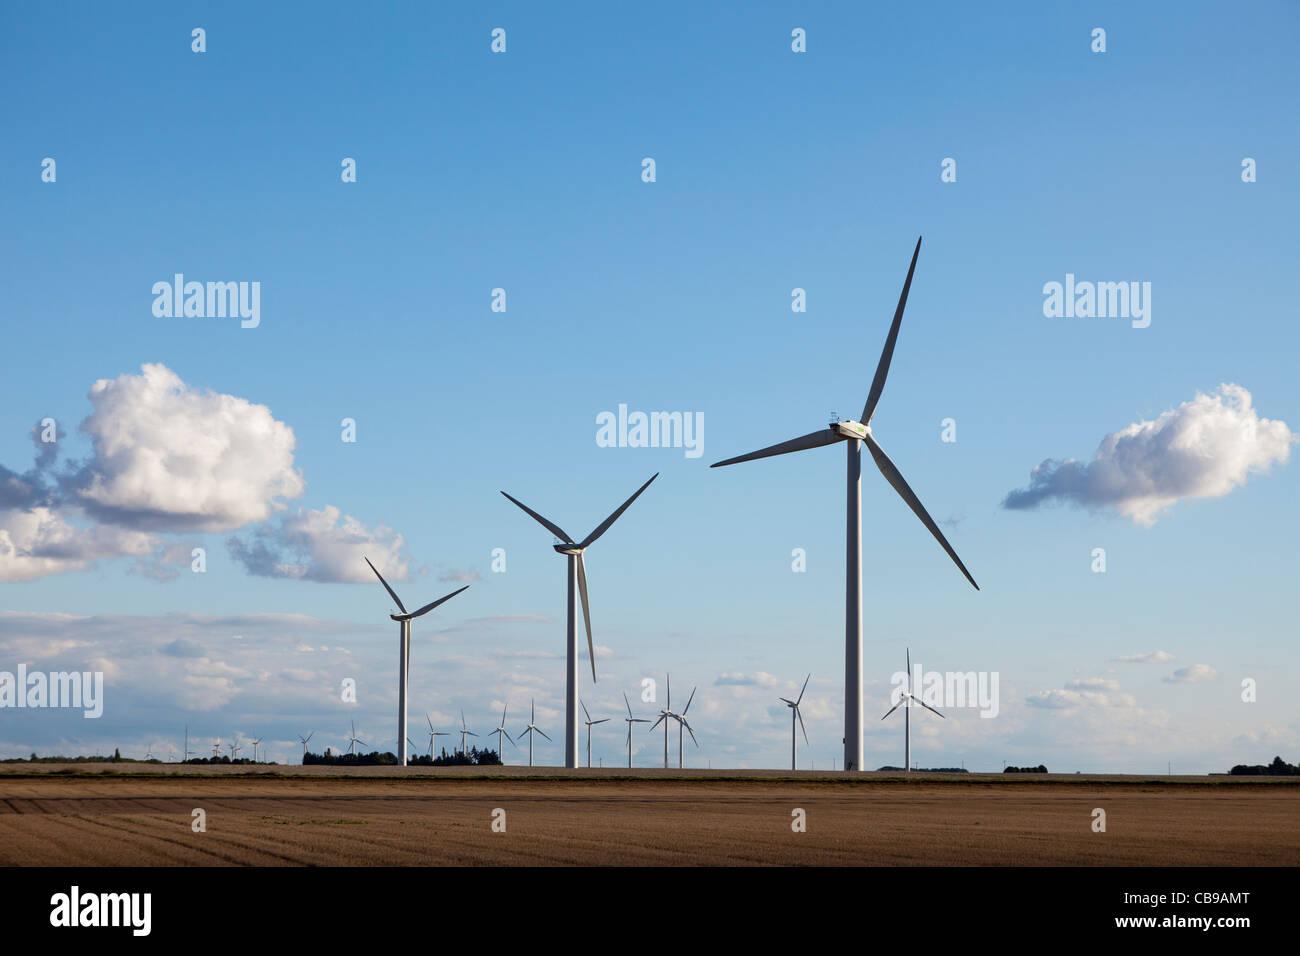 Wind turbines Eure-et-Loir France - Stock Image